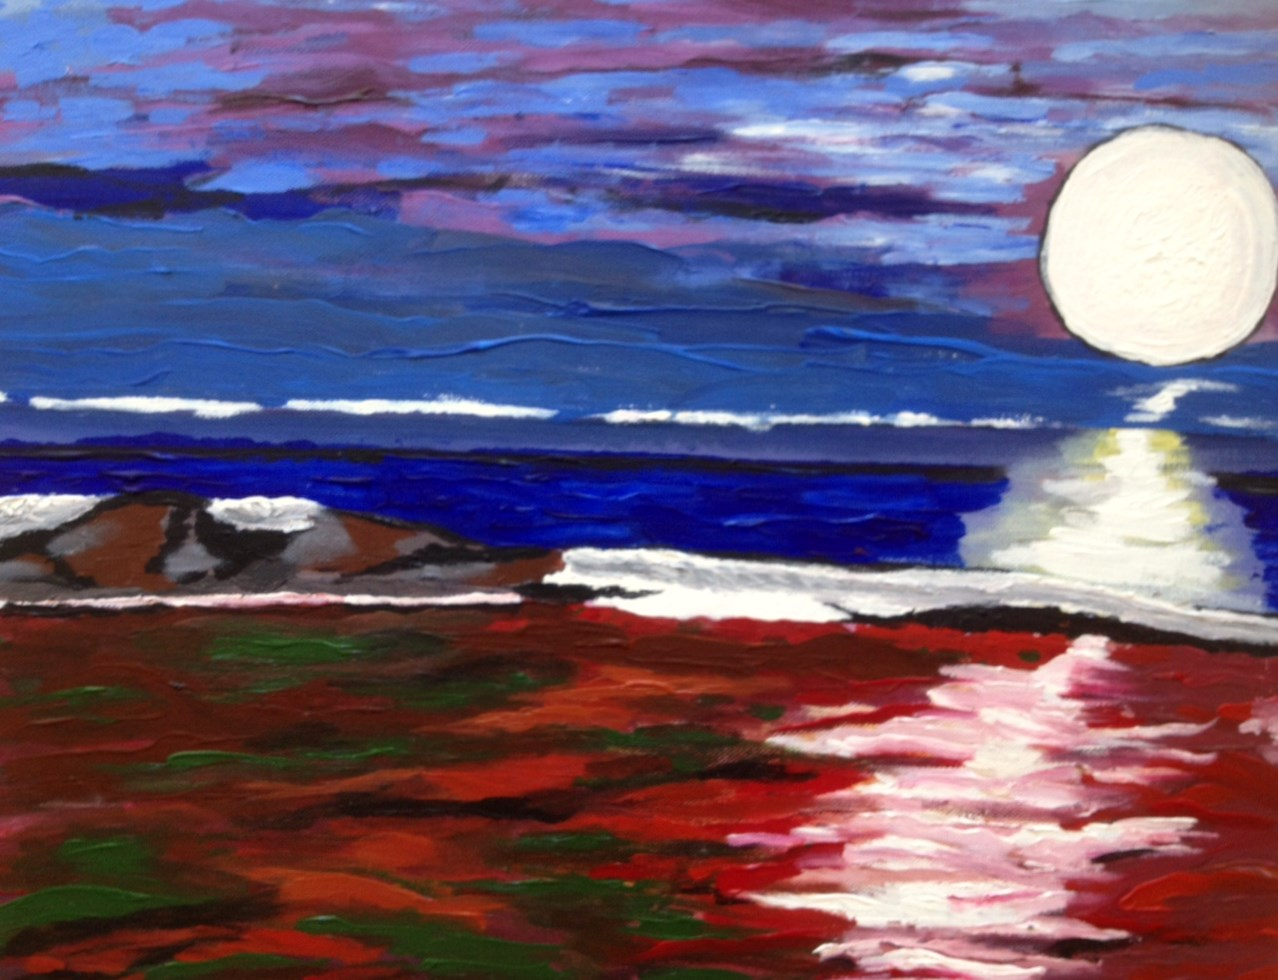 Bronte+Beach+full+moon.JPG